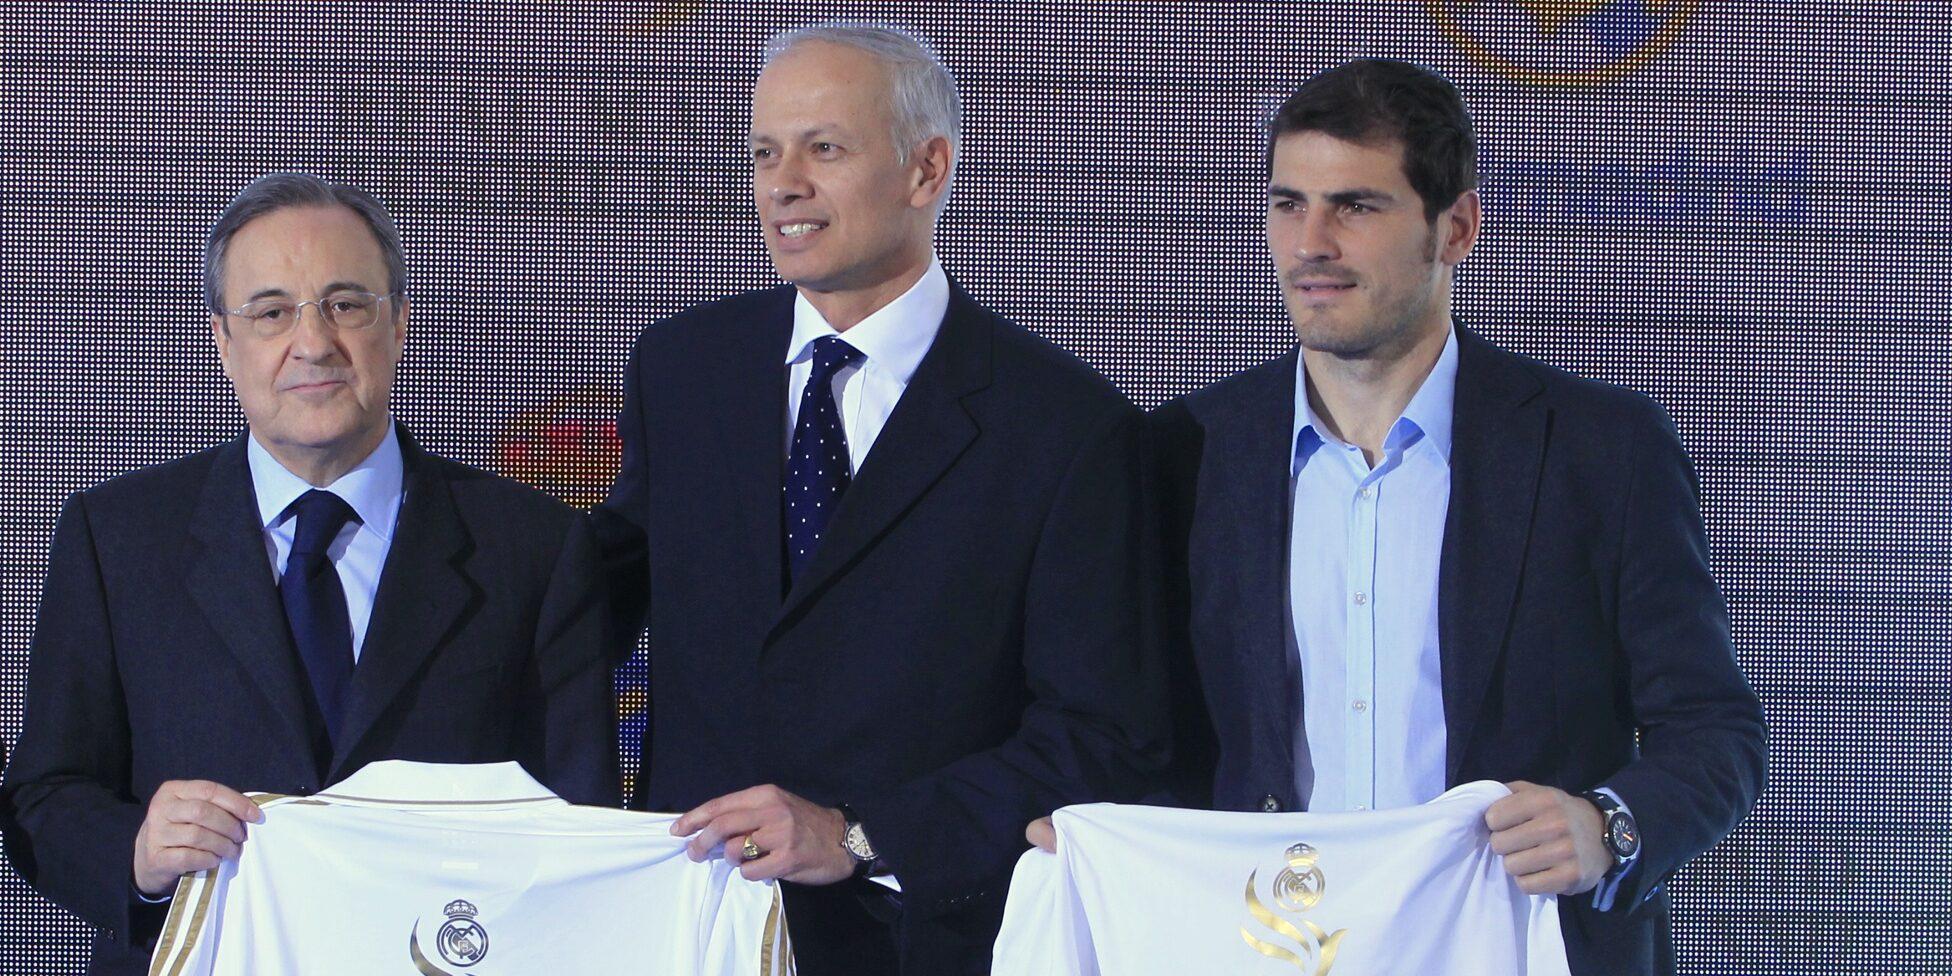 Florentino Pérez i Iker Casillas, en arxiu | Europa Press